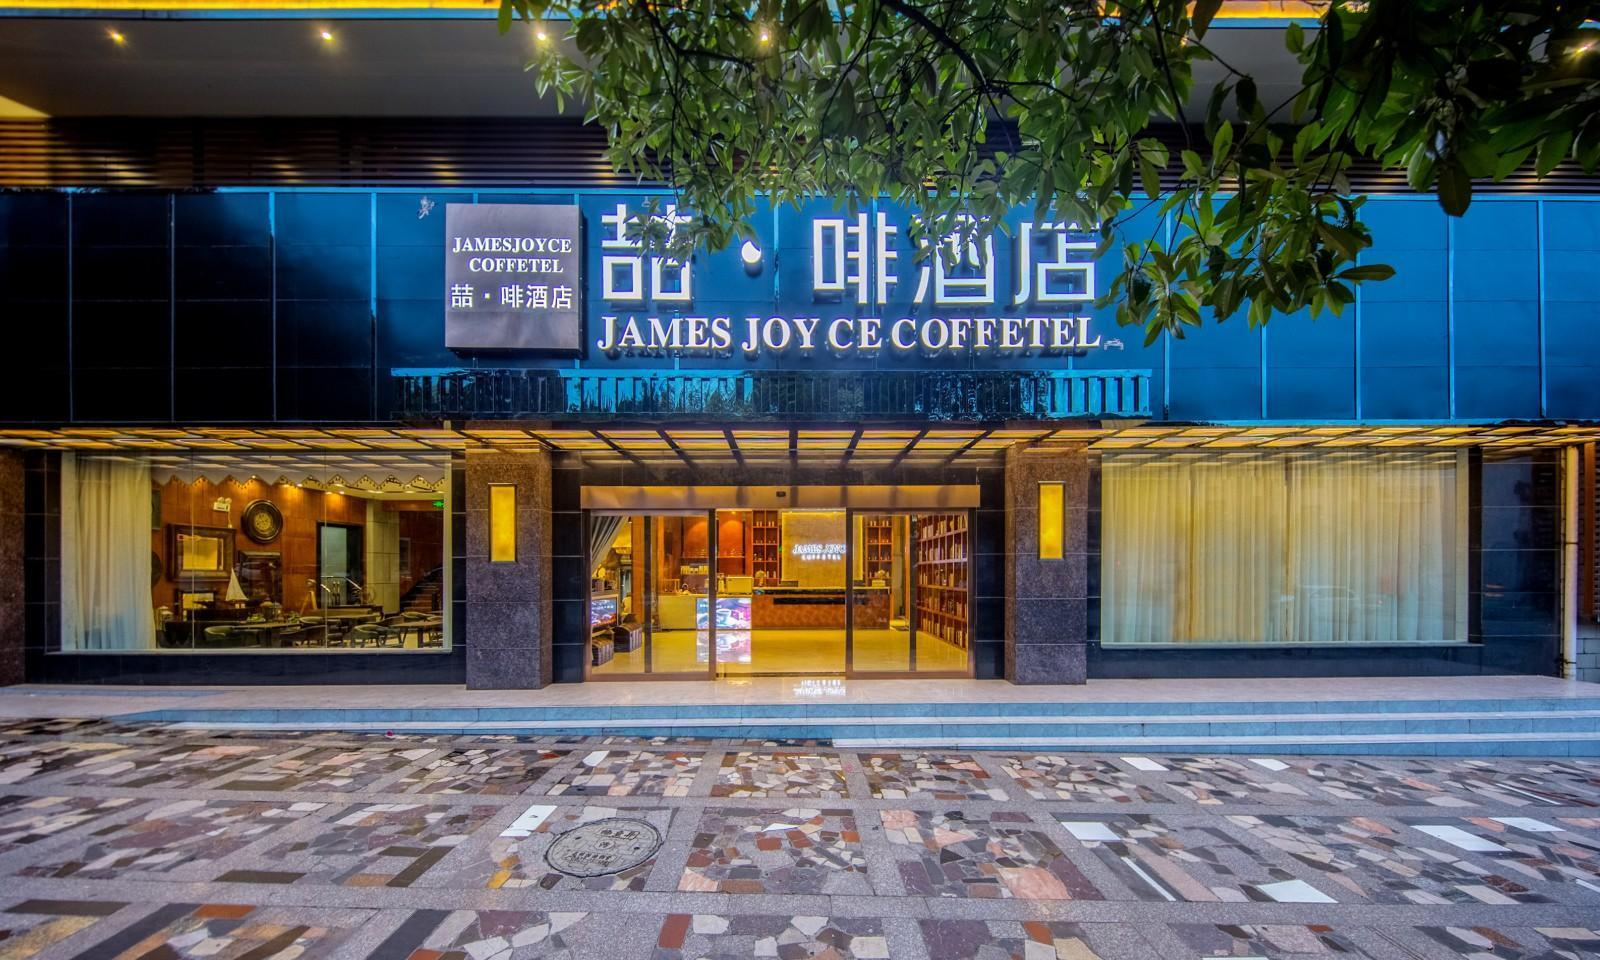 James Joyce Coffetel�Lijiang Old Town Centeral